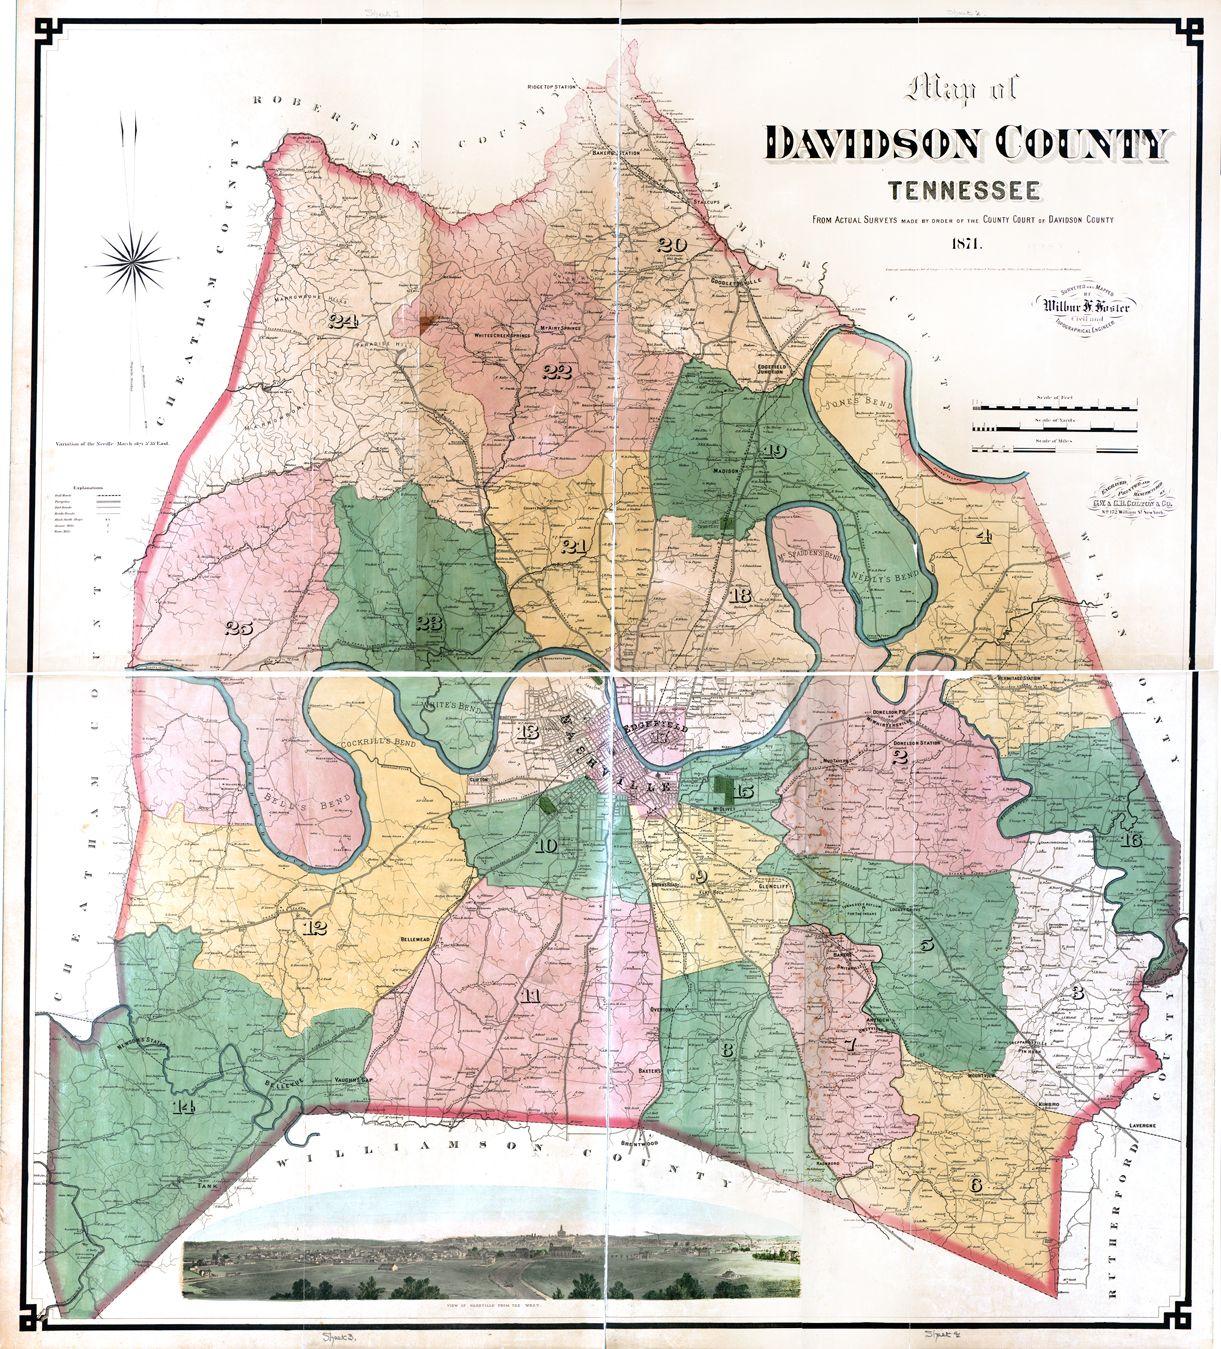 Nashville Us Map.1871 Map Of Nashville Historic Pictures Of Nashville Tn In 2019